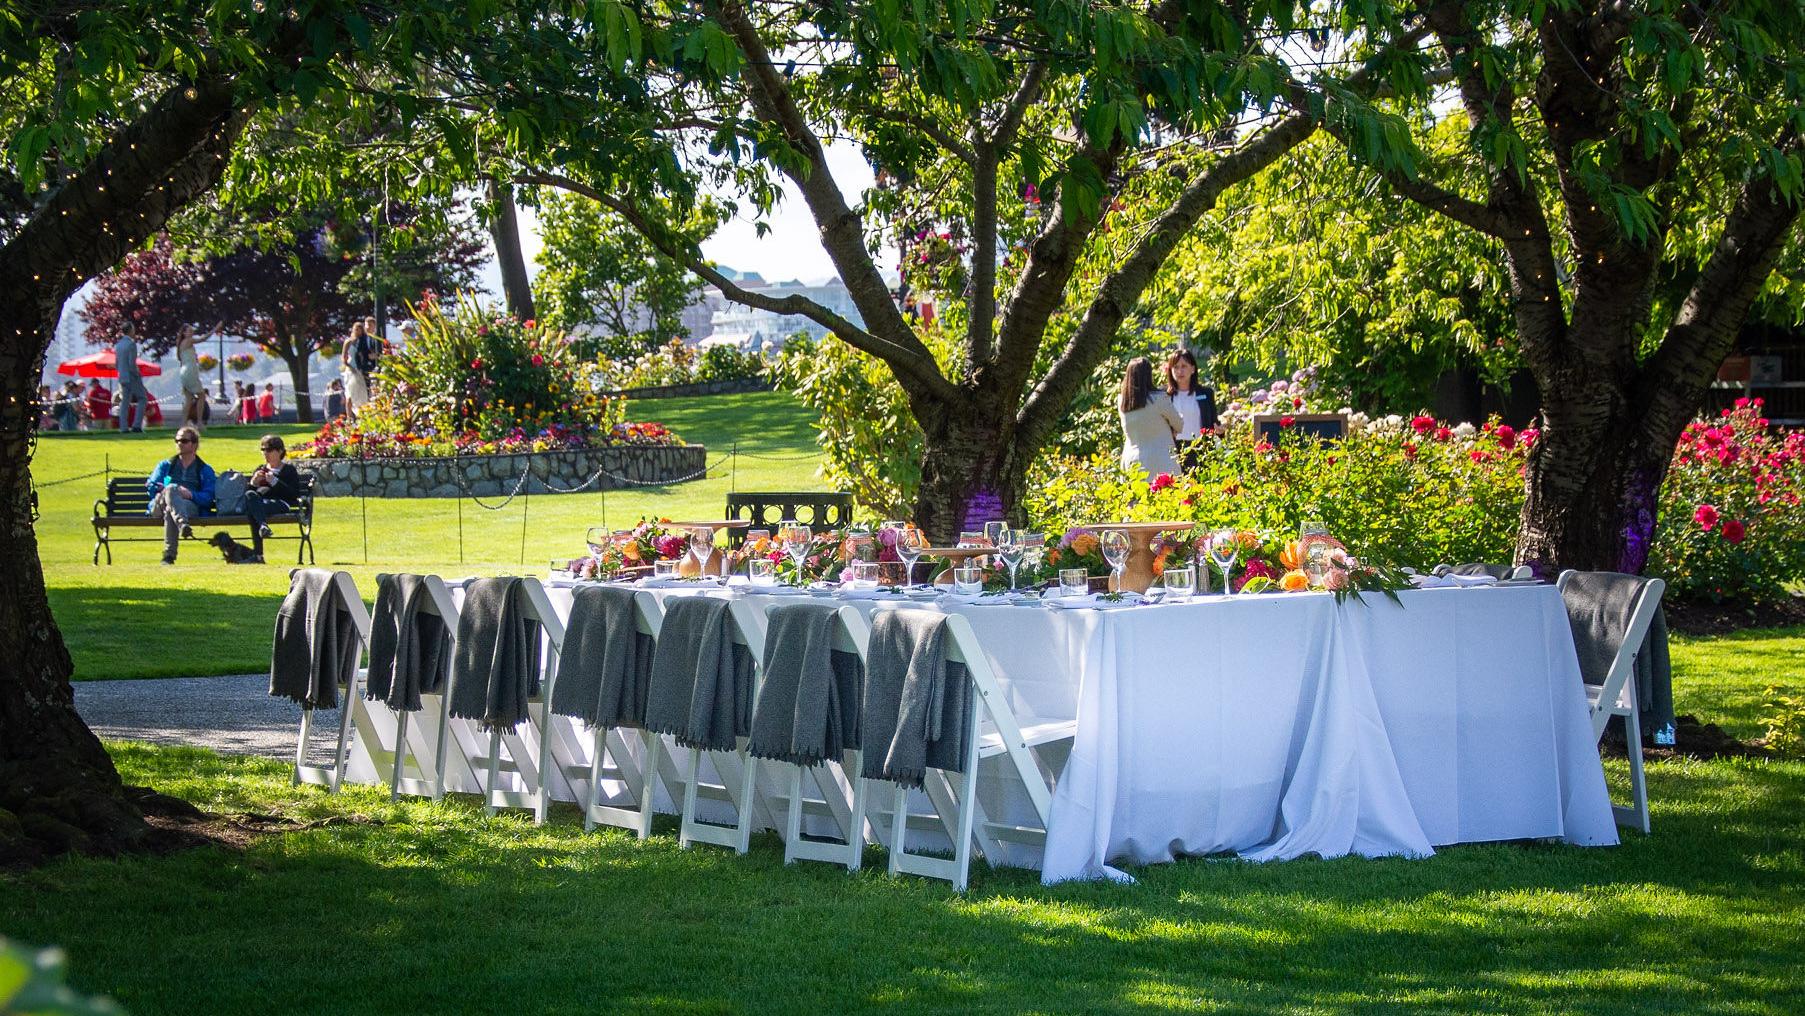 Fairmont Rose Garden